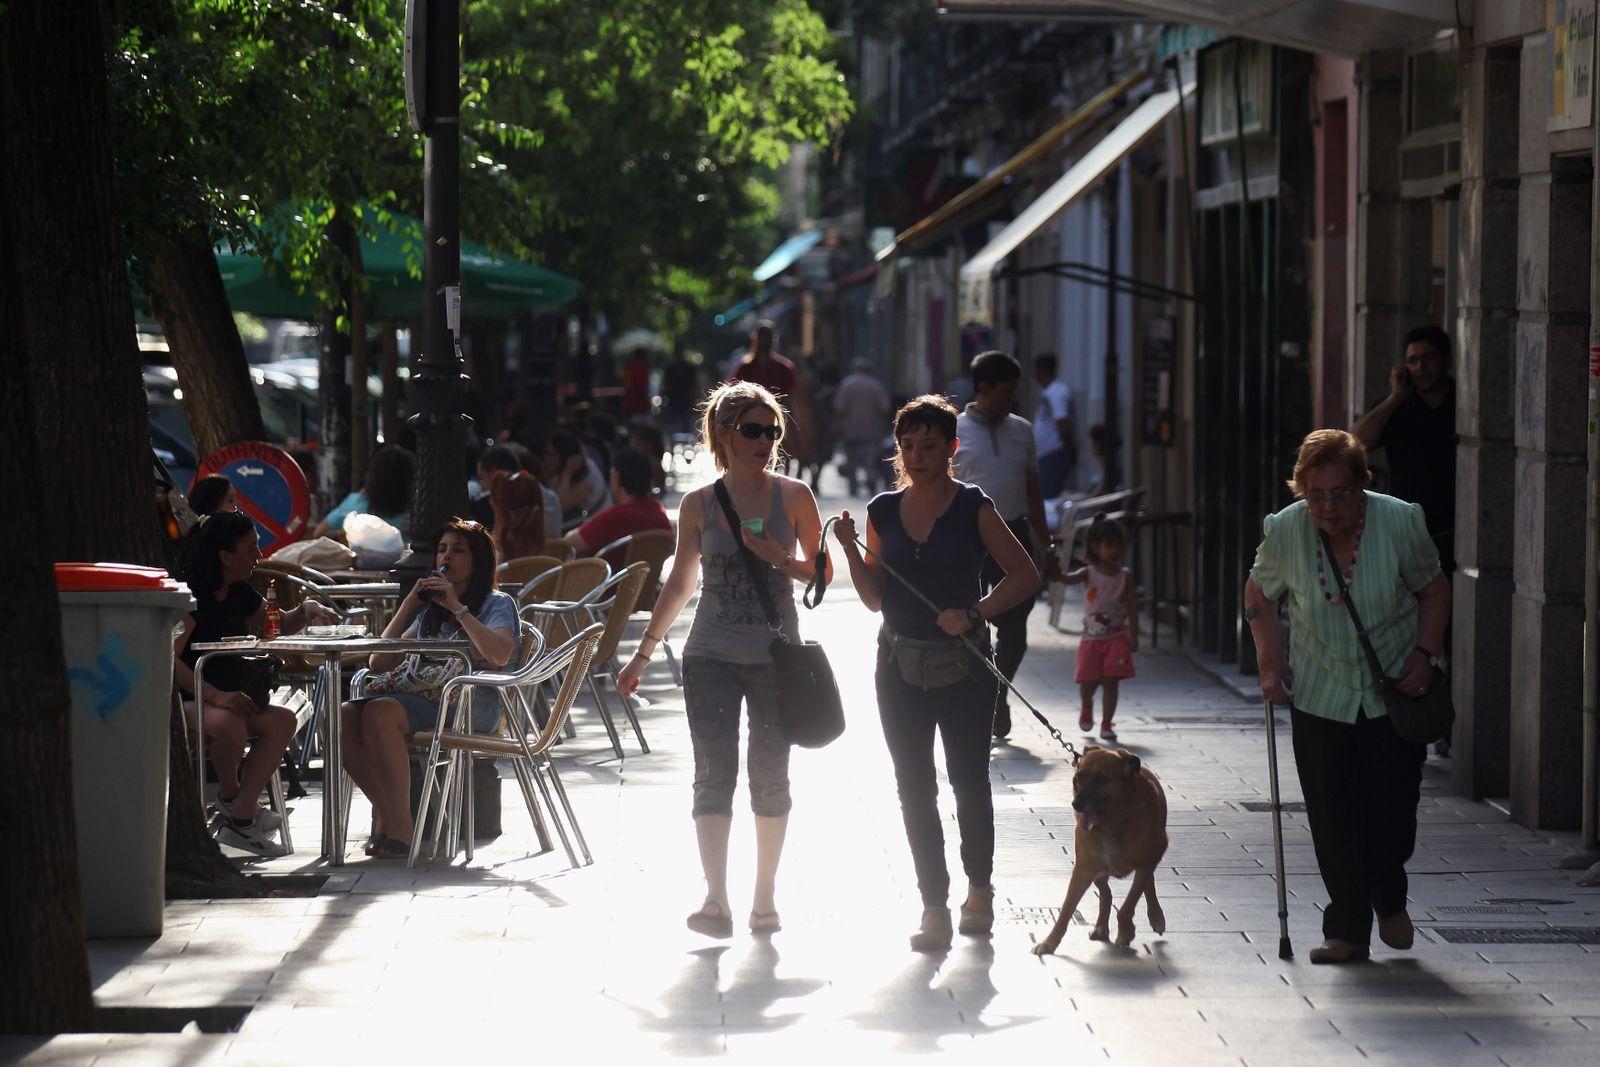 Lokale / Cafe / Lokal / Madrid / Spanien